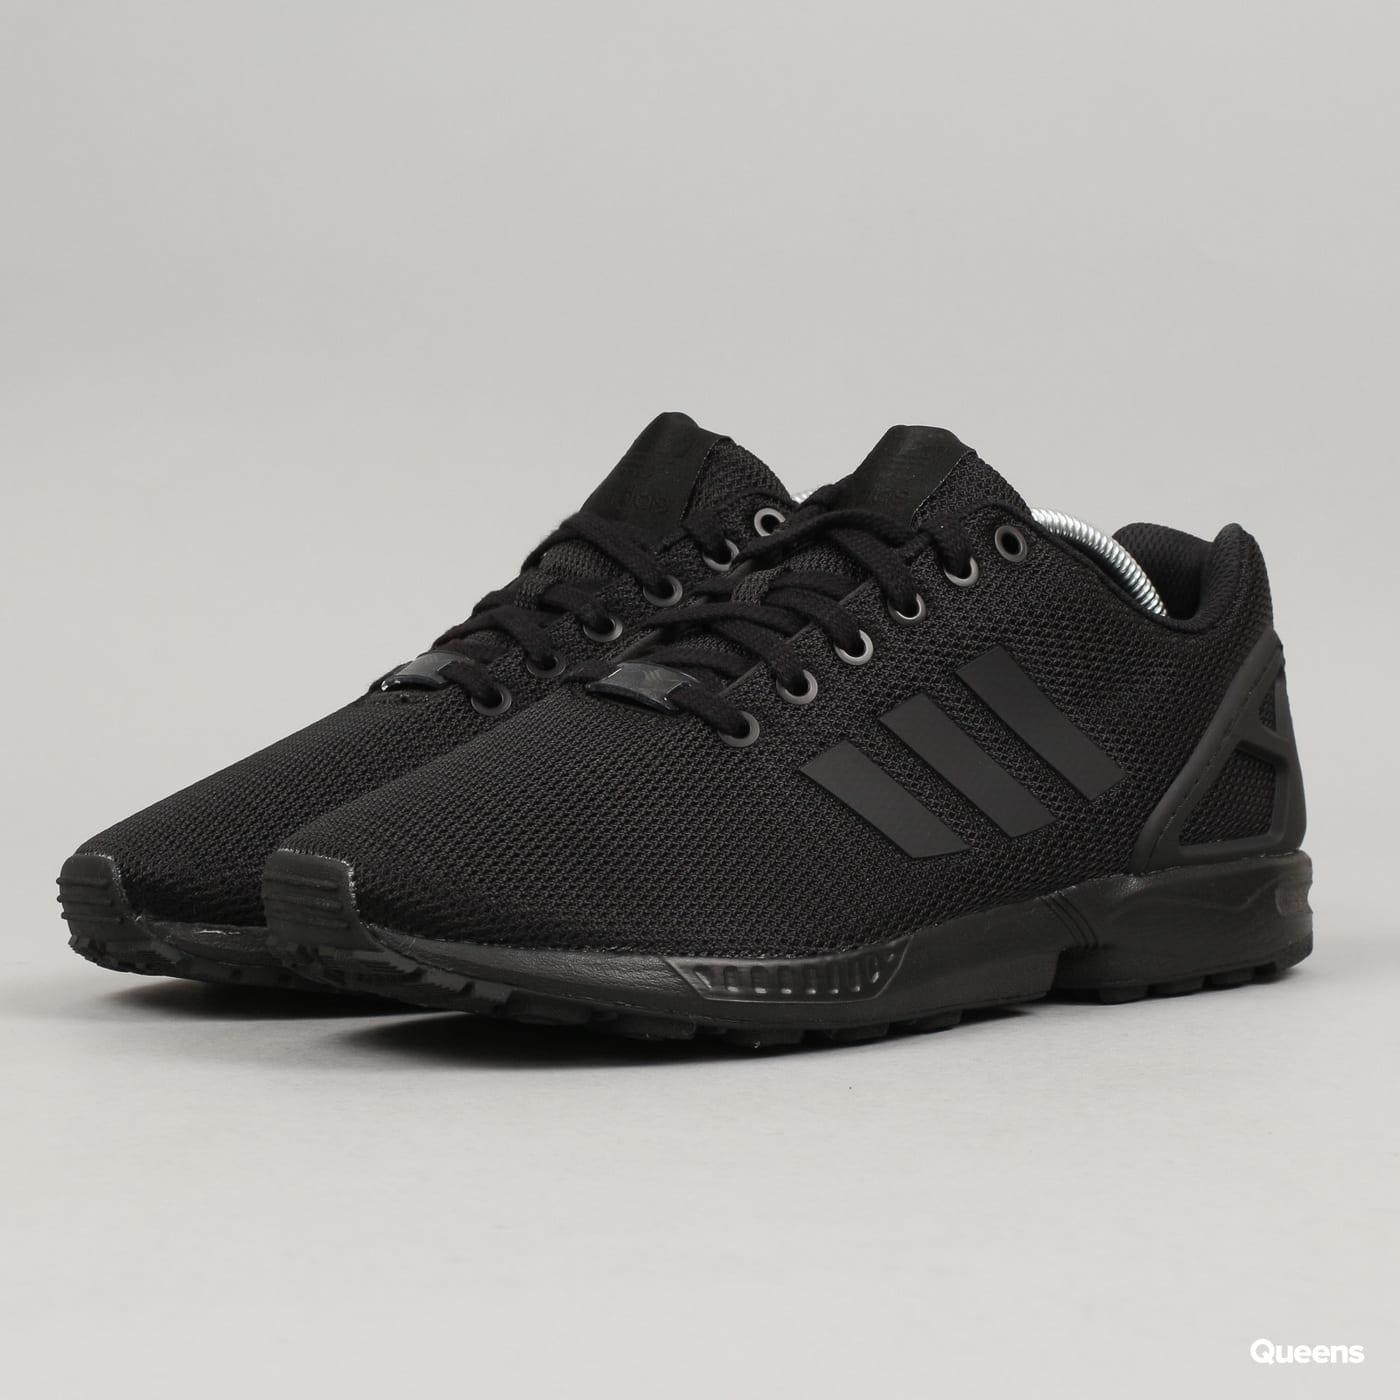 adidas Originals ZX Flux cblack / cblack / dkgrey